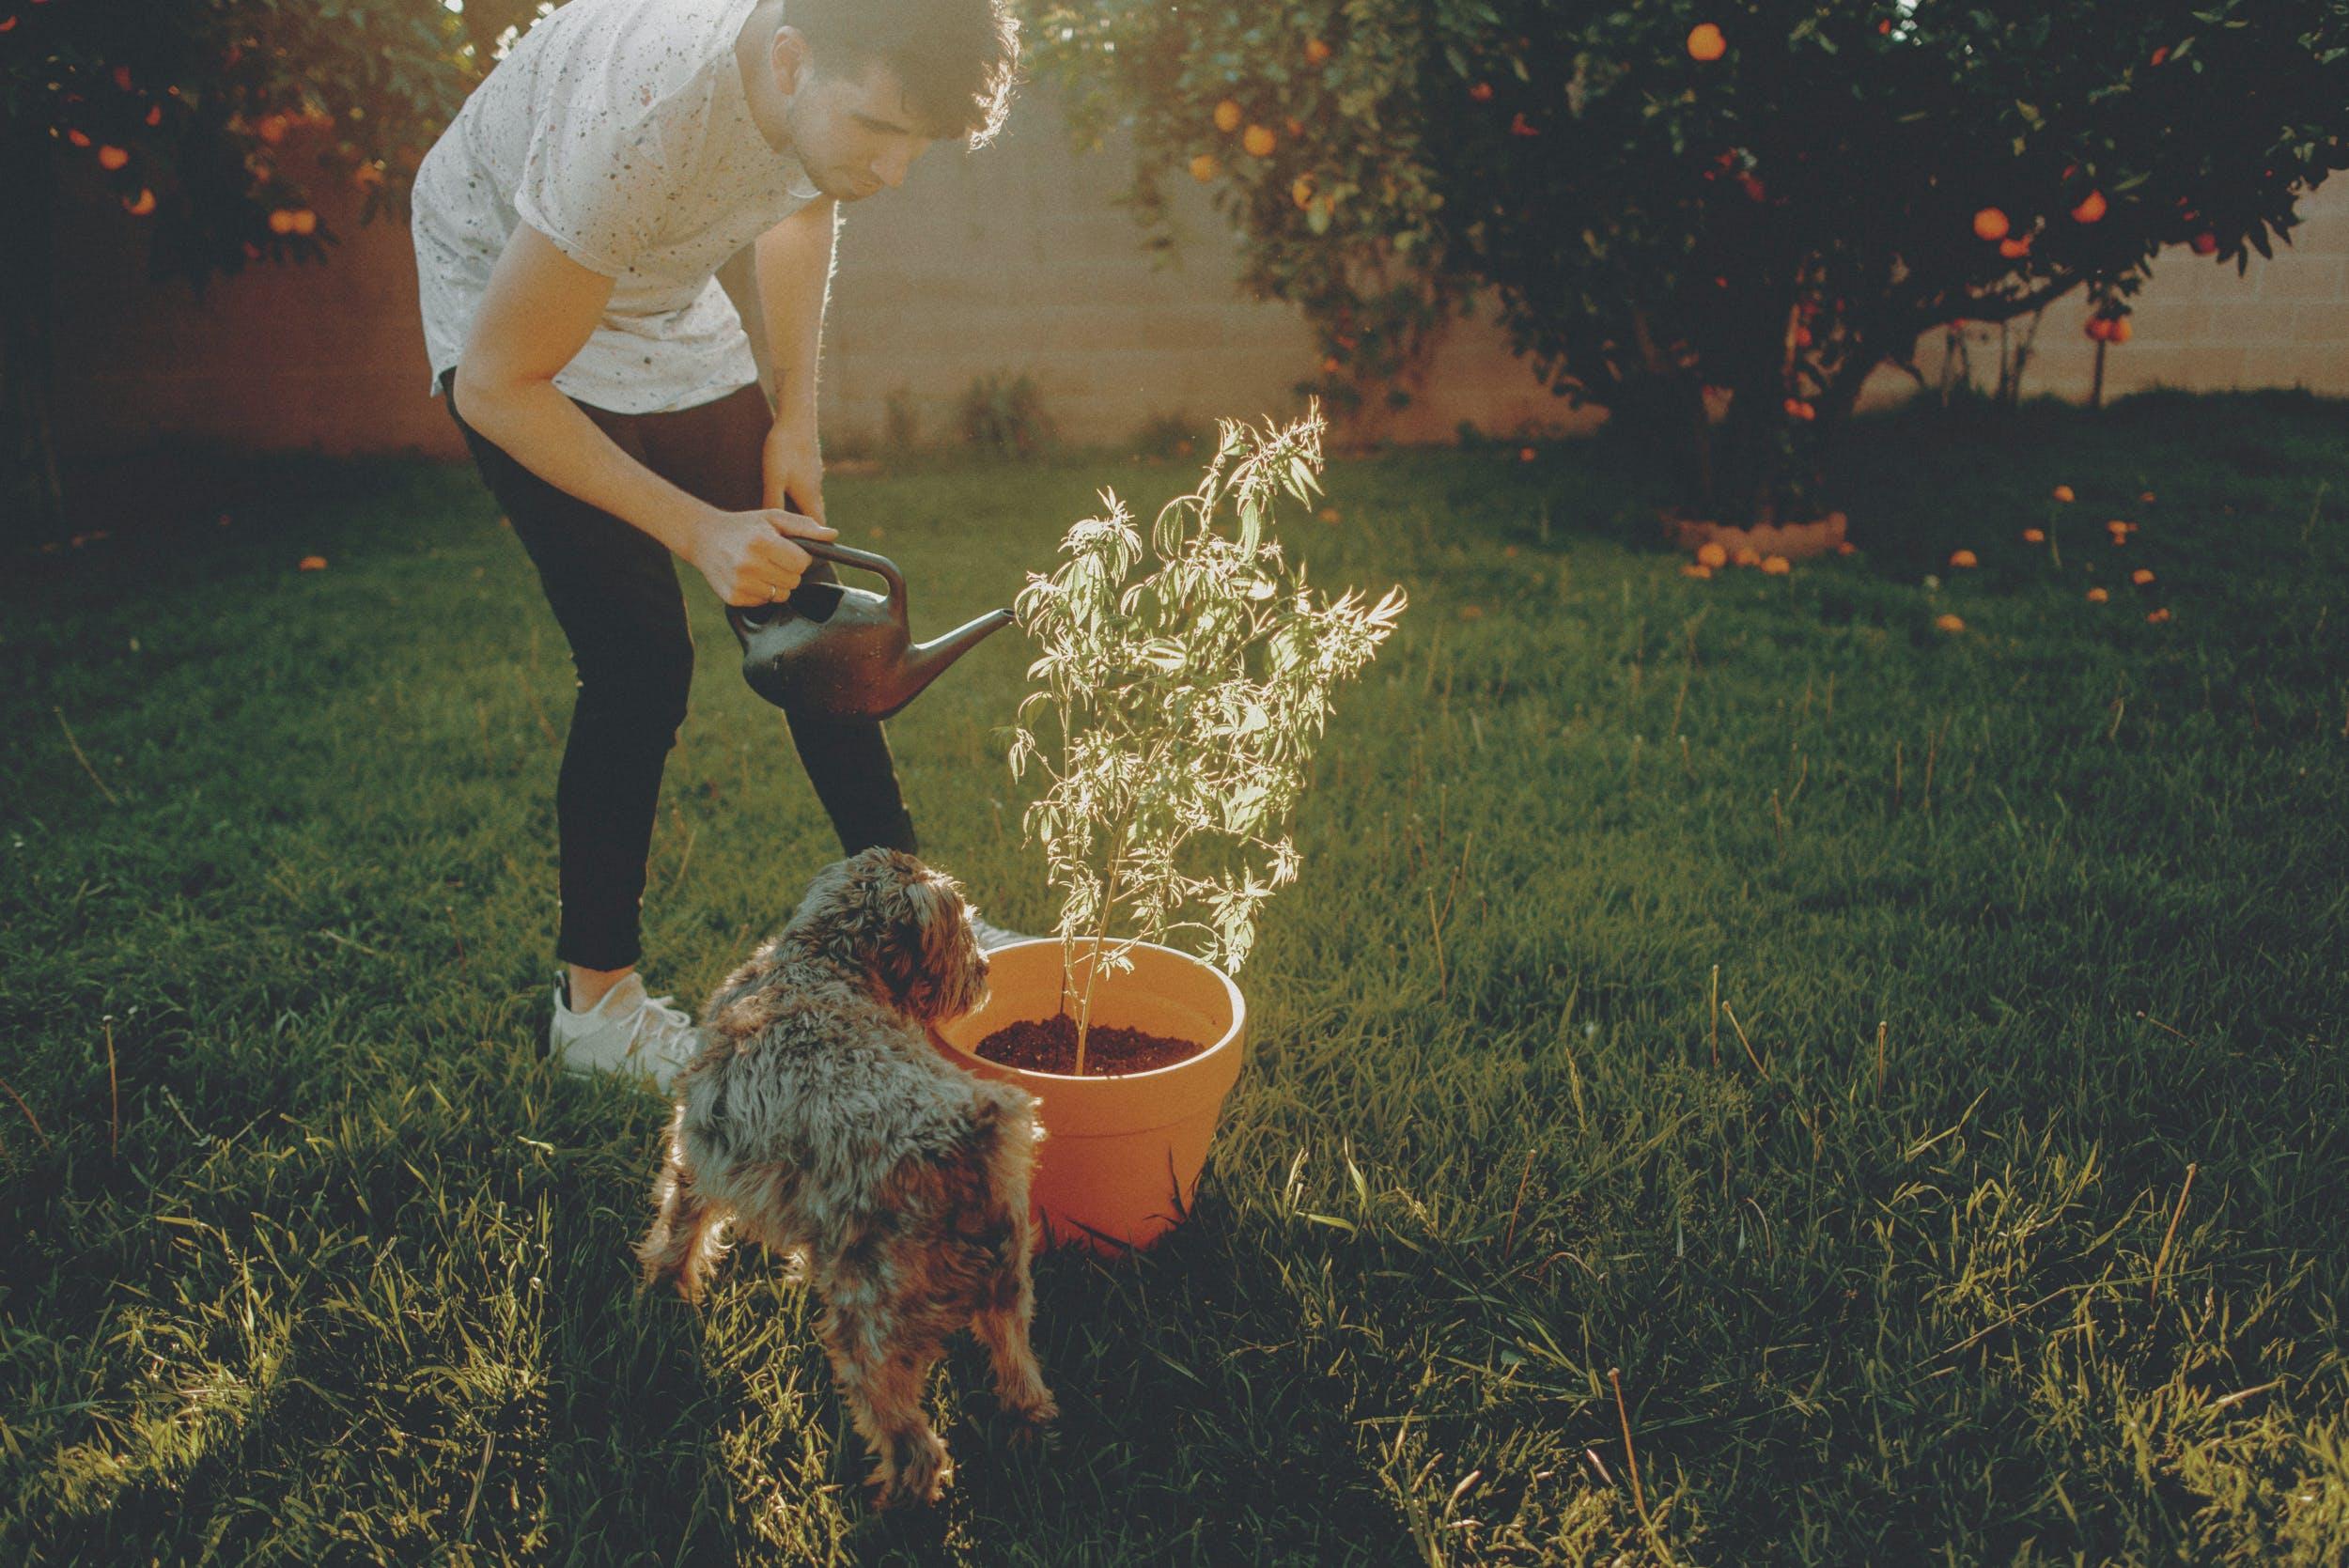 How to Make Super Soil 21 How To Make Super Soil And Grow Better Cannabis Plants